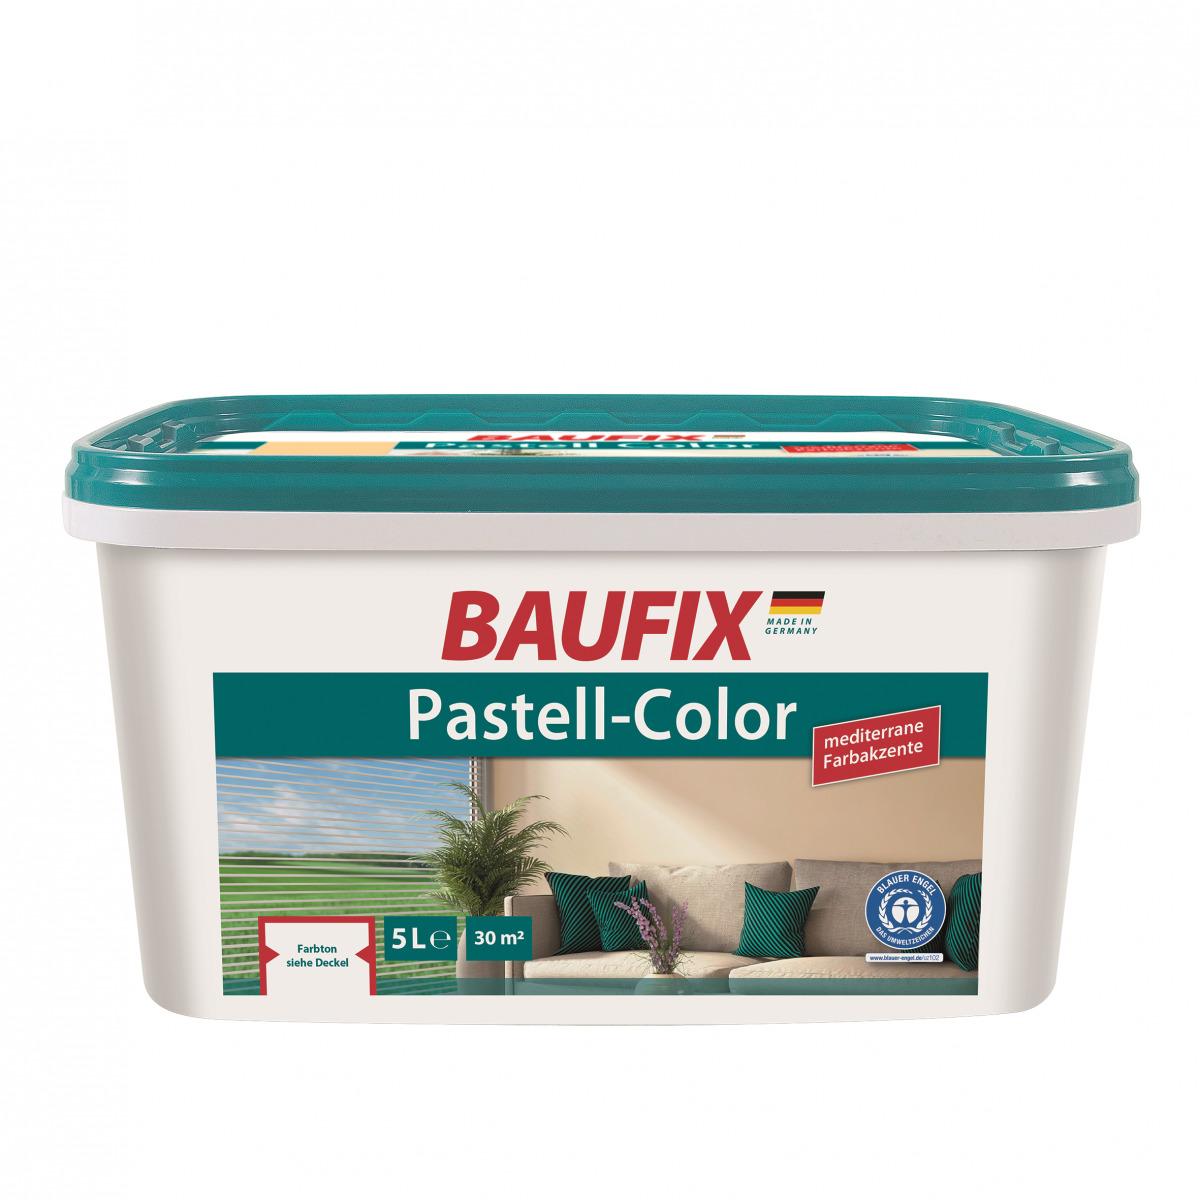 Bild 1 von Baufix Pastell-Color sky